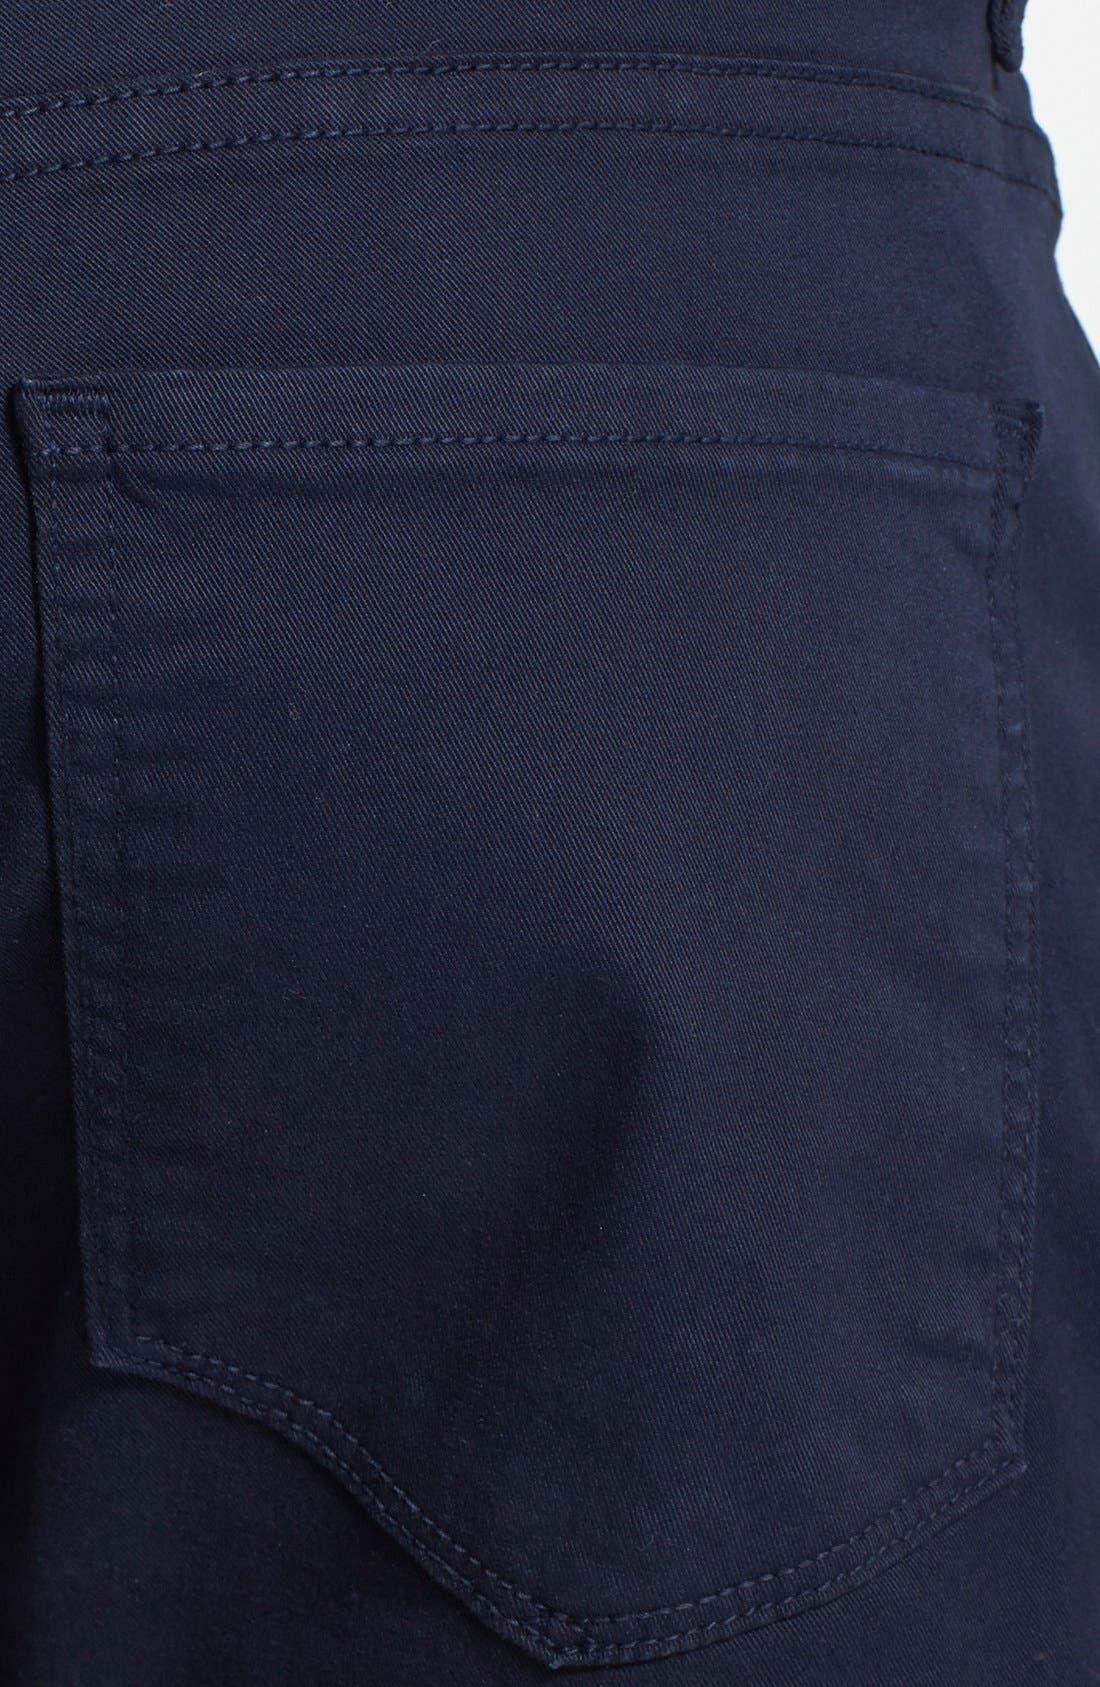 PAIGE, Normandie Slim Straight Leg Twill Pants, Alternate thumbnail 6, color, NAVY CADET